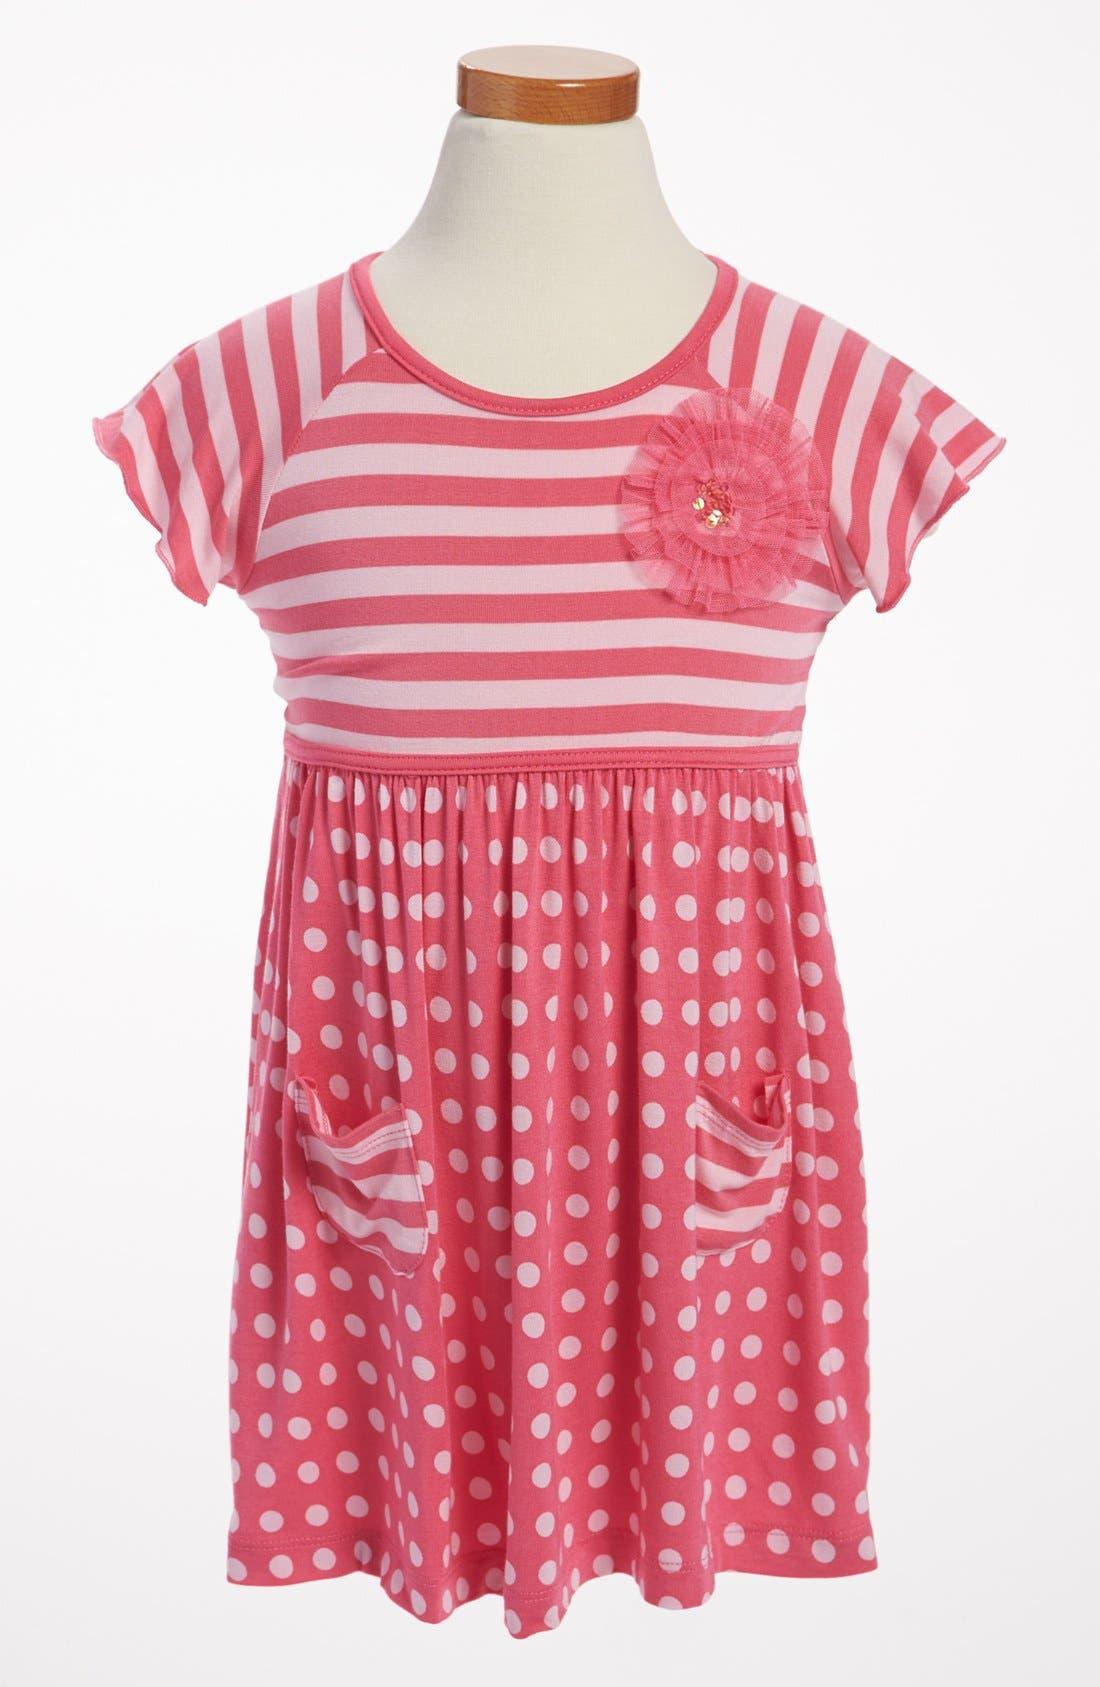 Alternate Image 1 Selected - Design History Dress (Toddler)